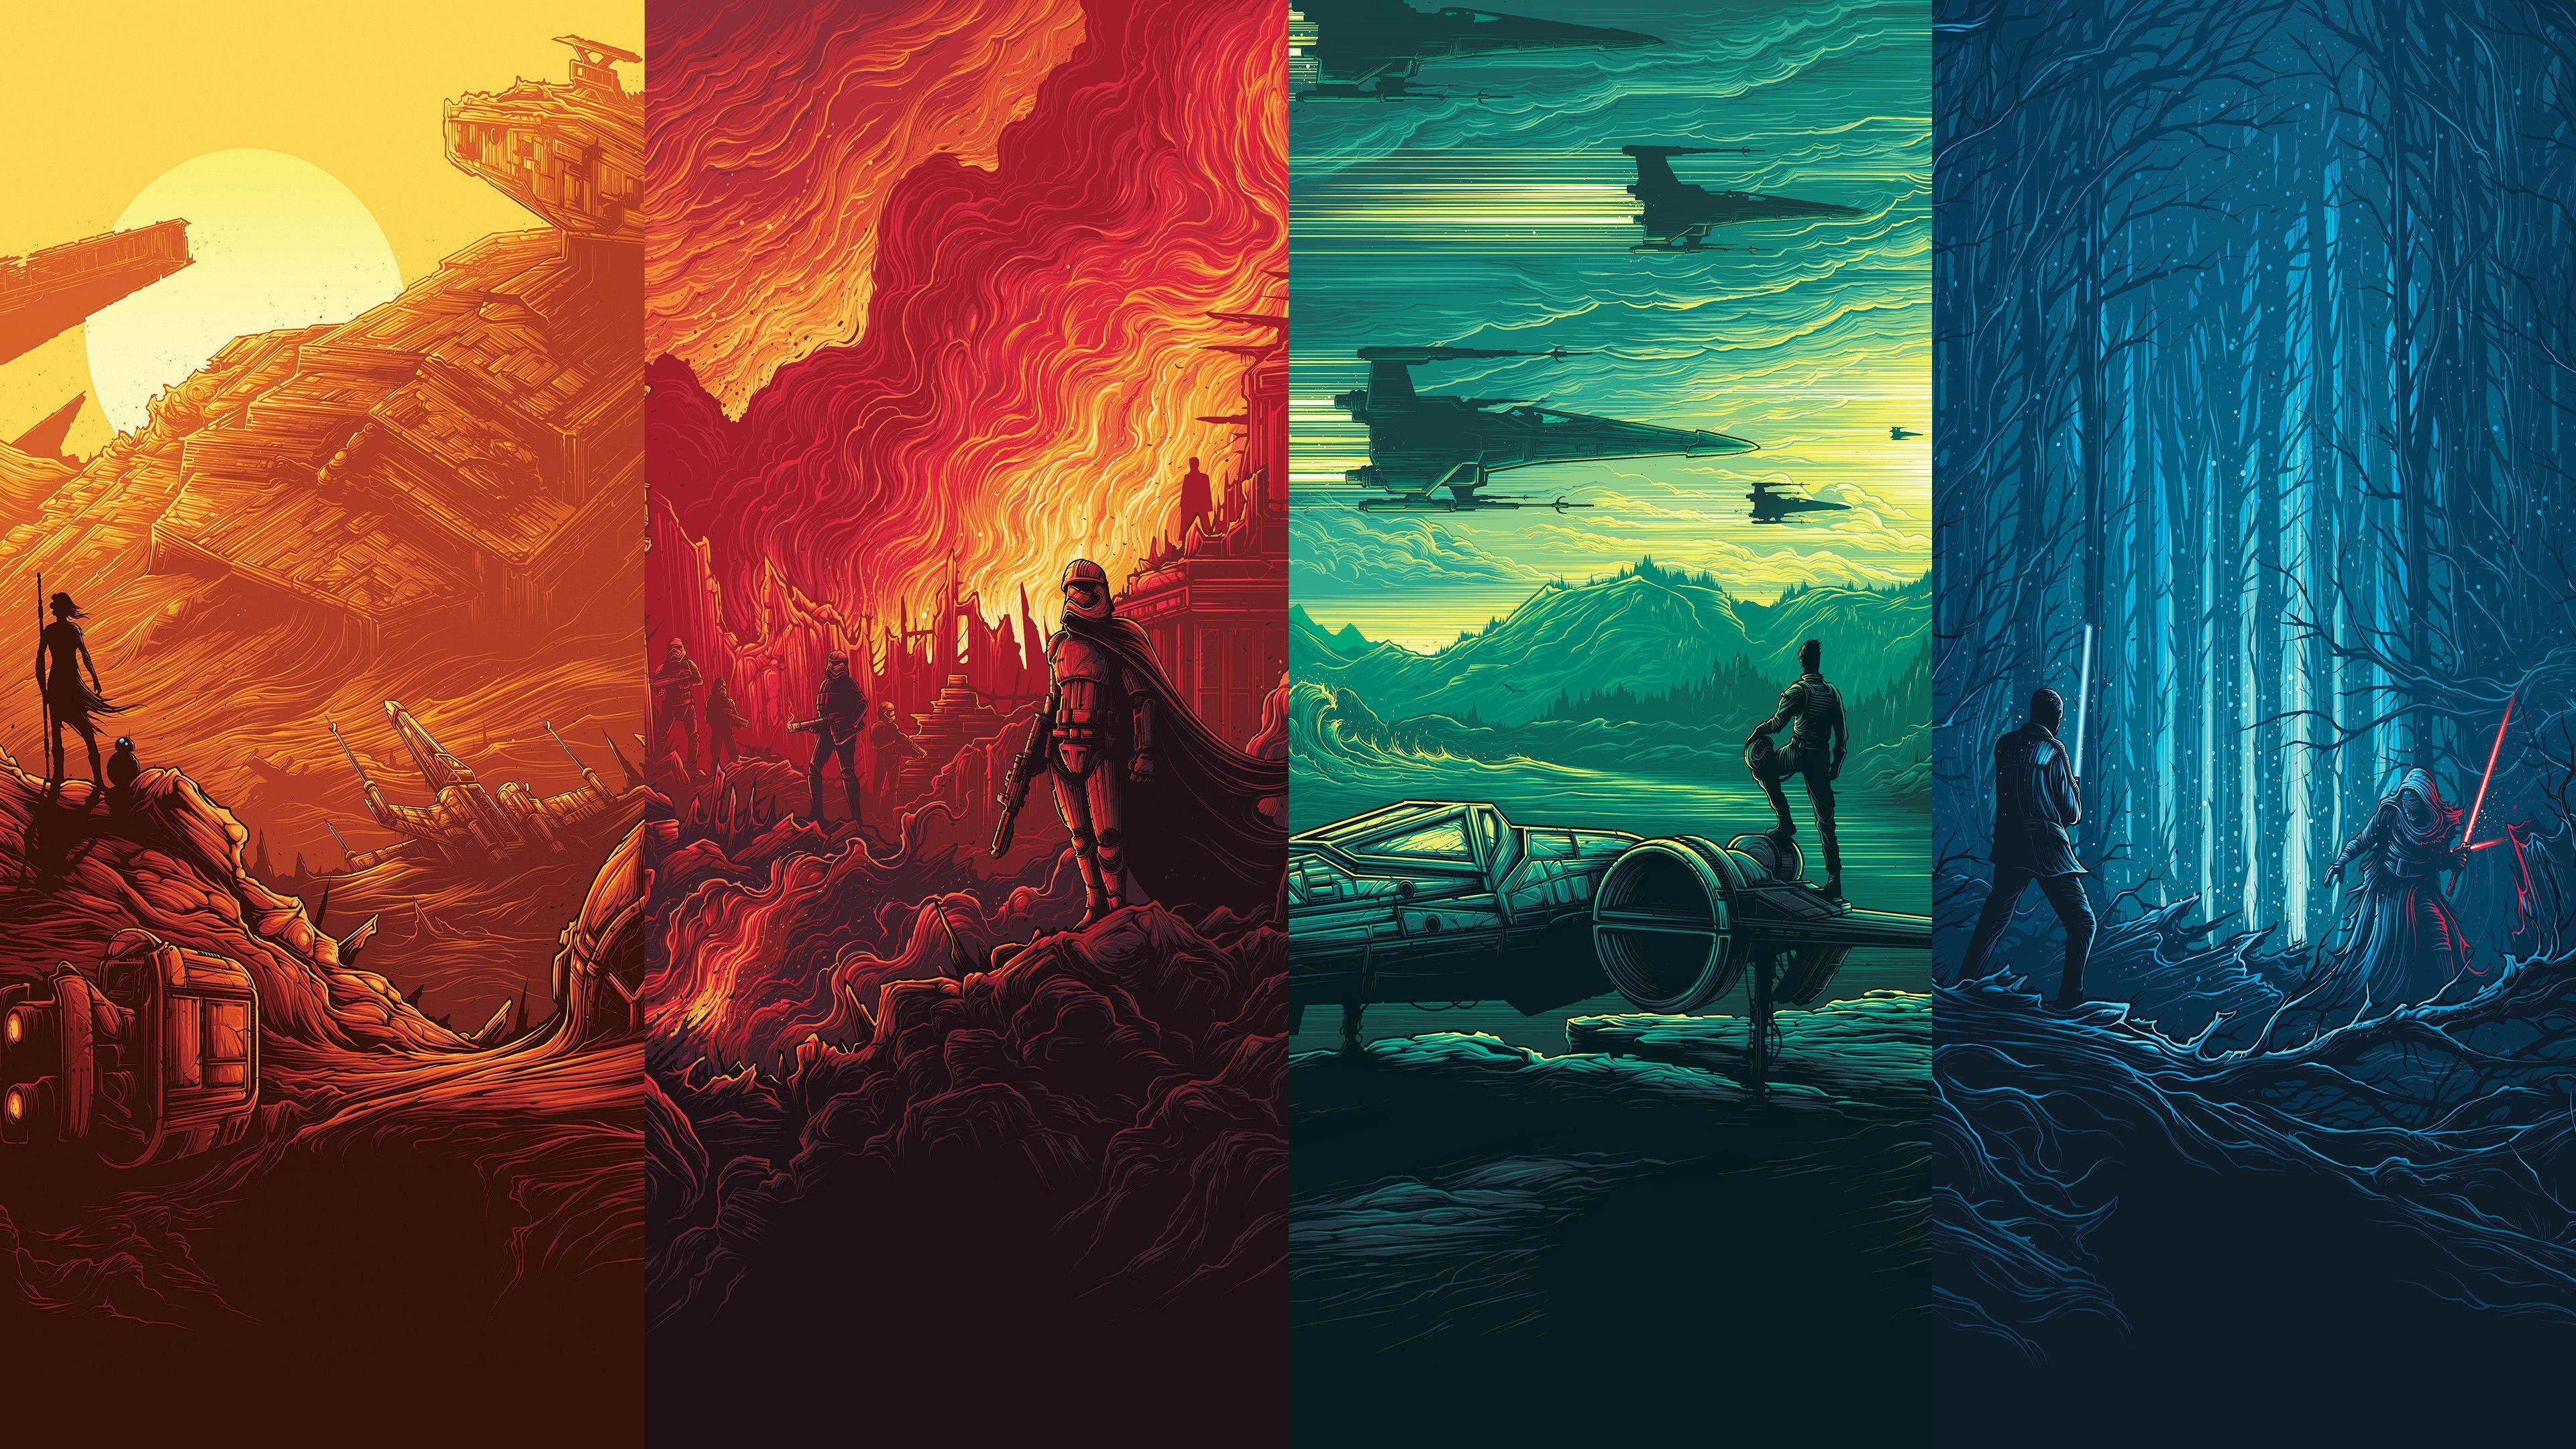 4k 16 9 Star Wars Wallpapers Top Free 4k 16 9 Star Wars Backgrounds Wallpaperaccess